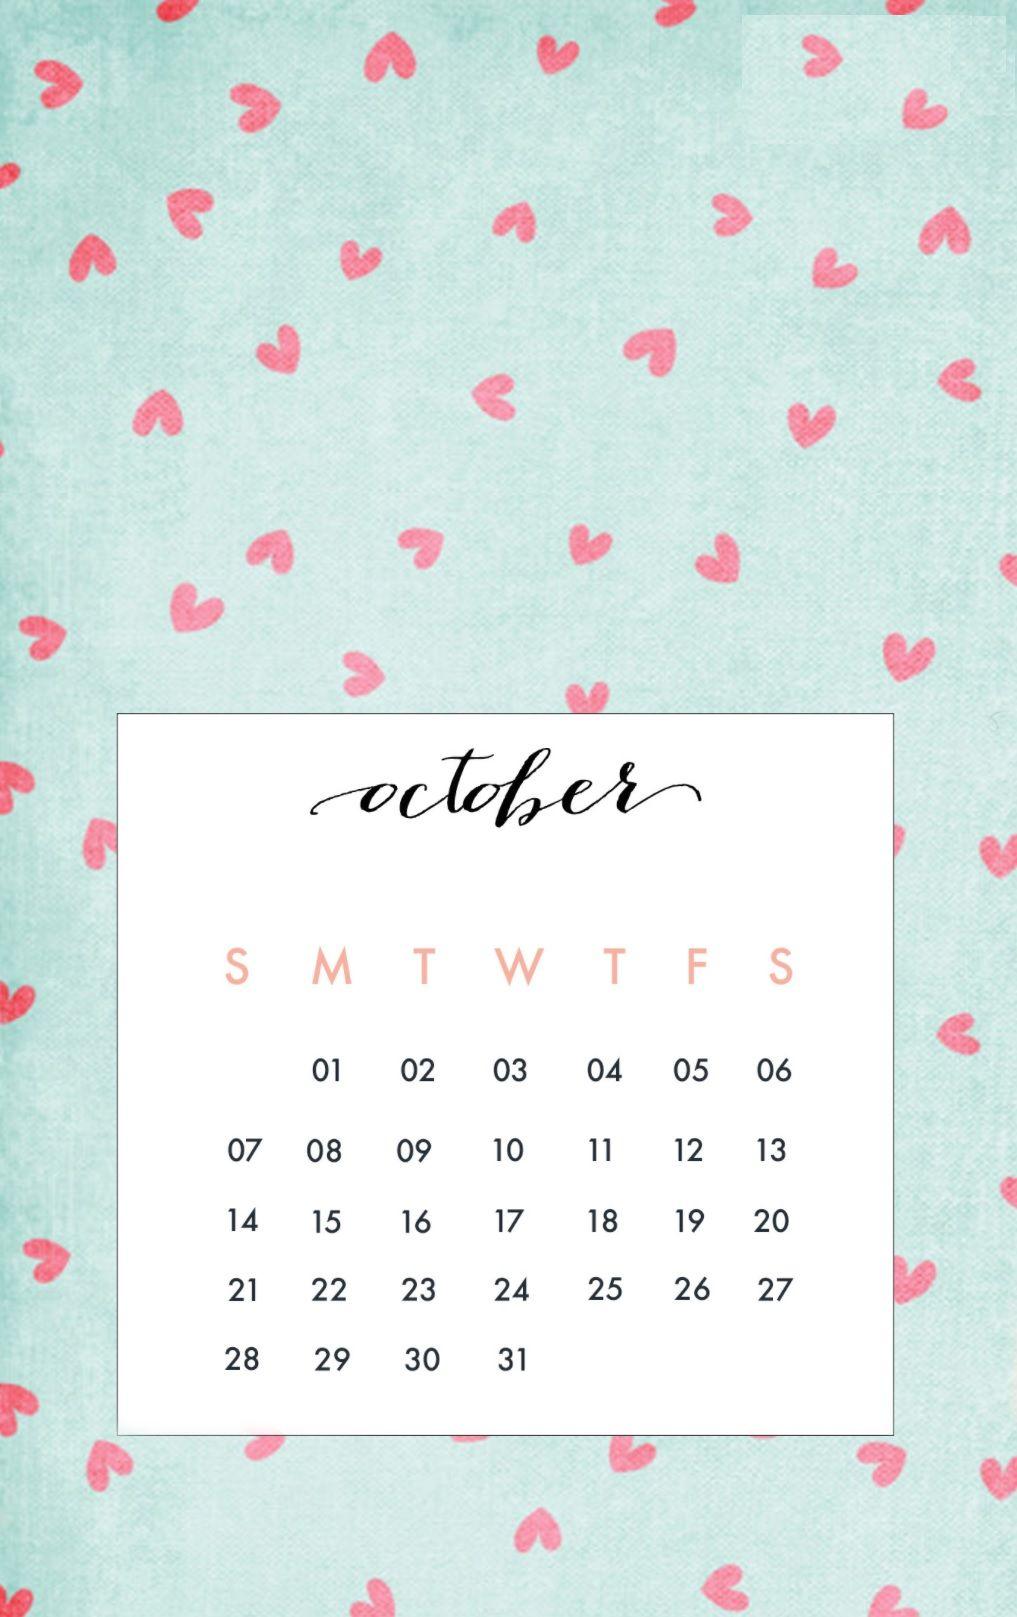 Calendar Iphone Wallpaper : October iphone calendar wallpapers